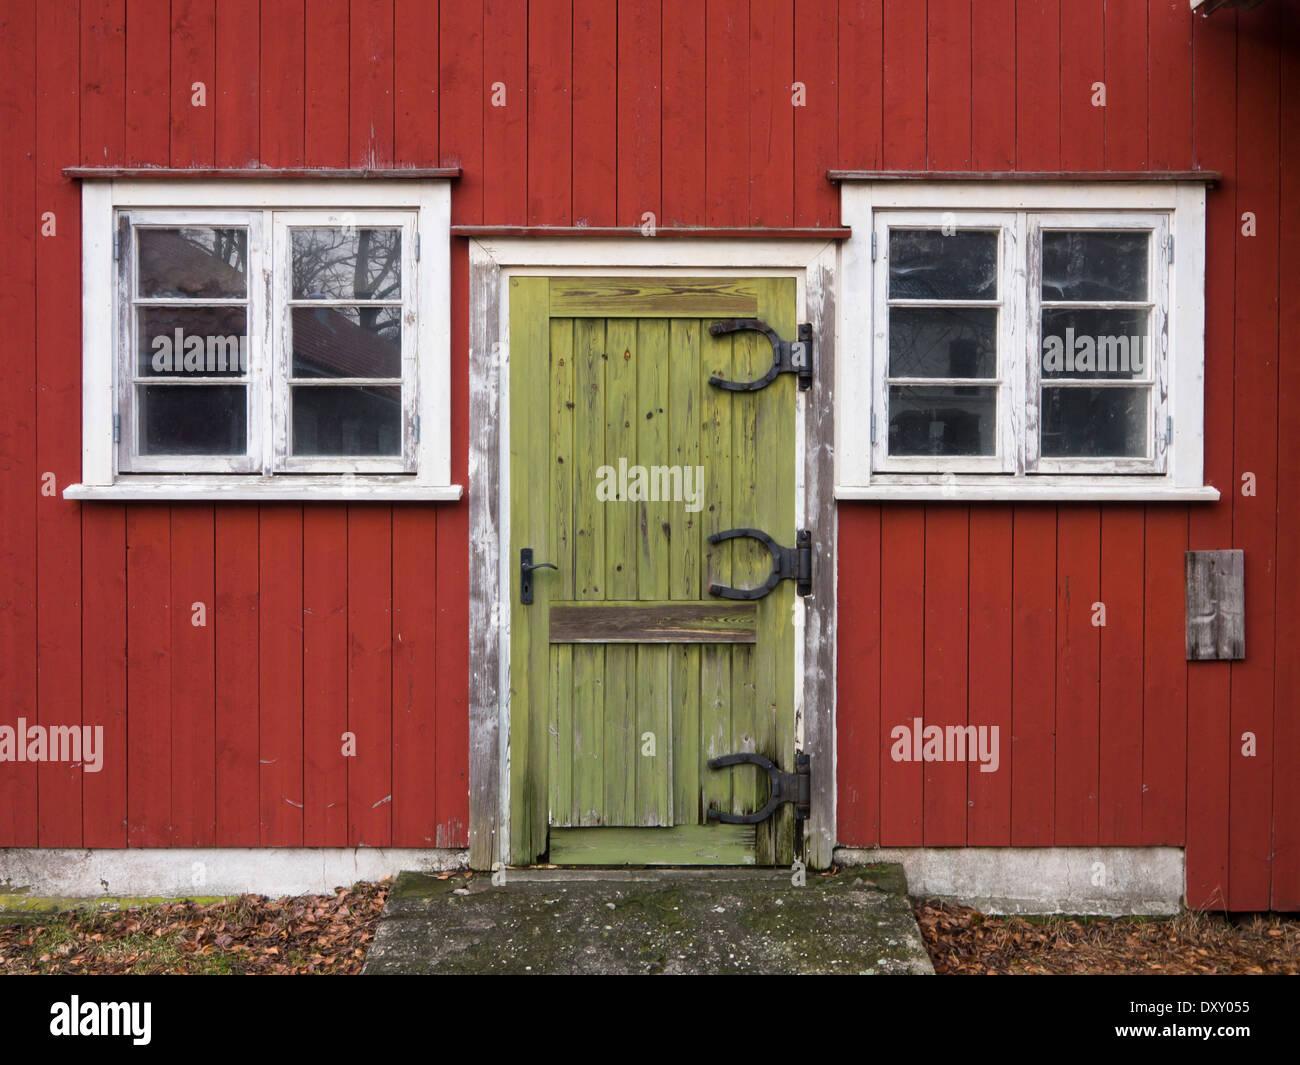 Hinges stockfotos hinges bilder alamy - Grune fensterrahmen ...